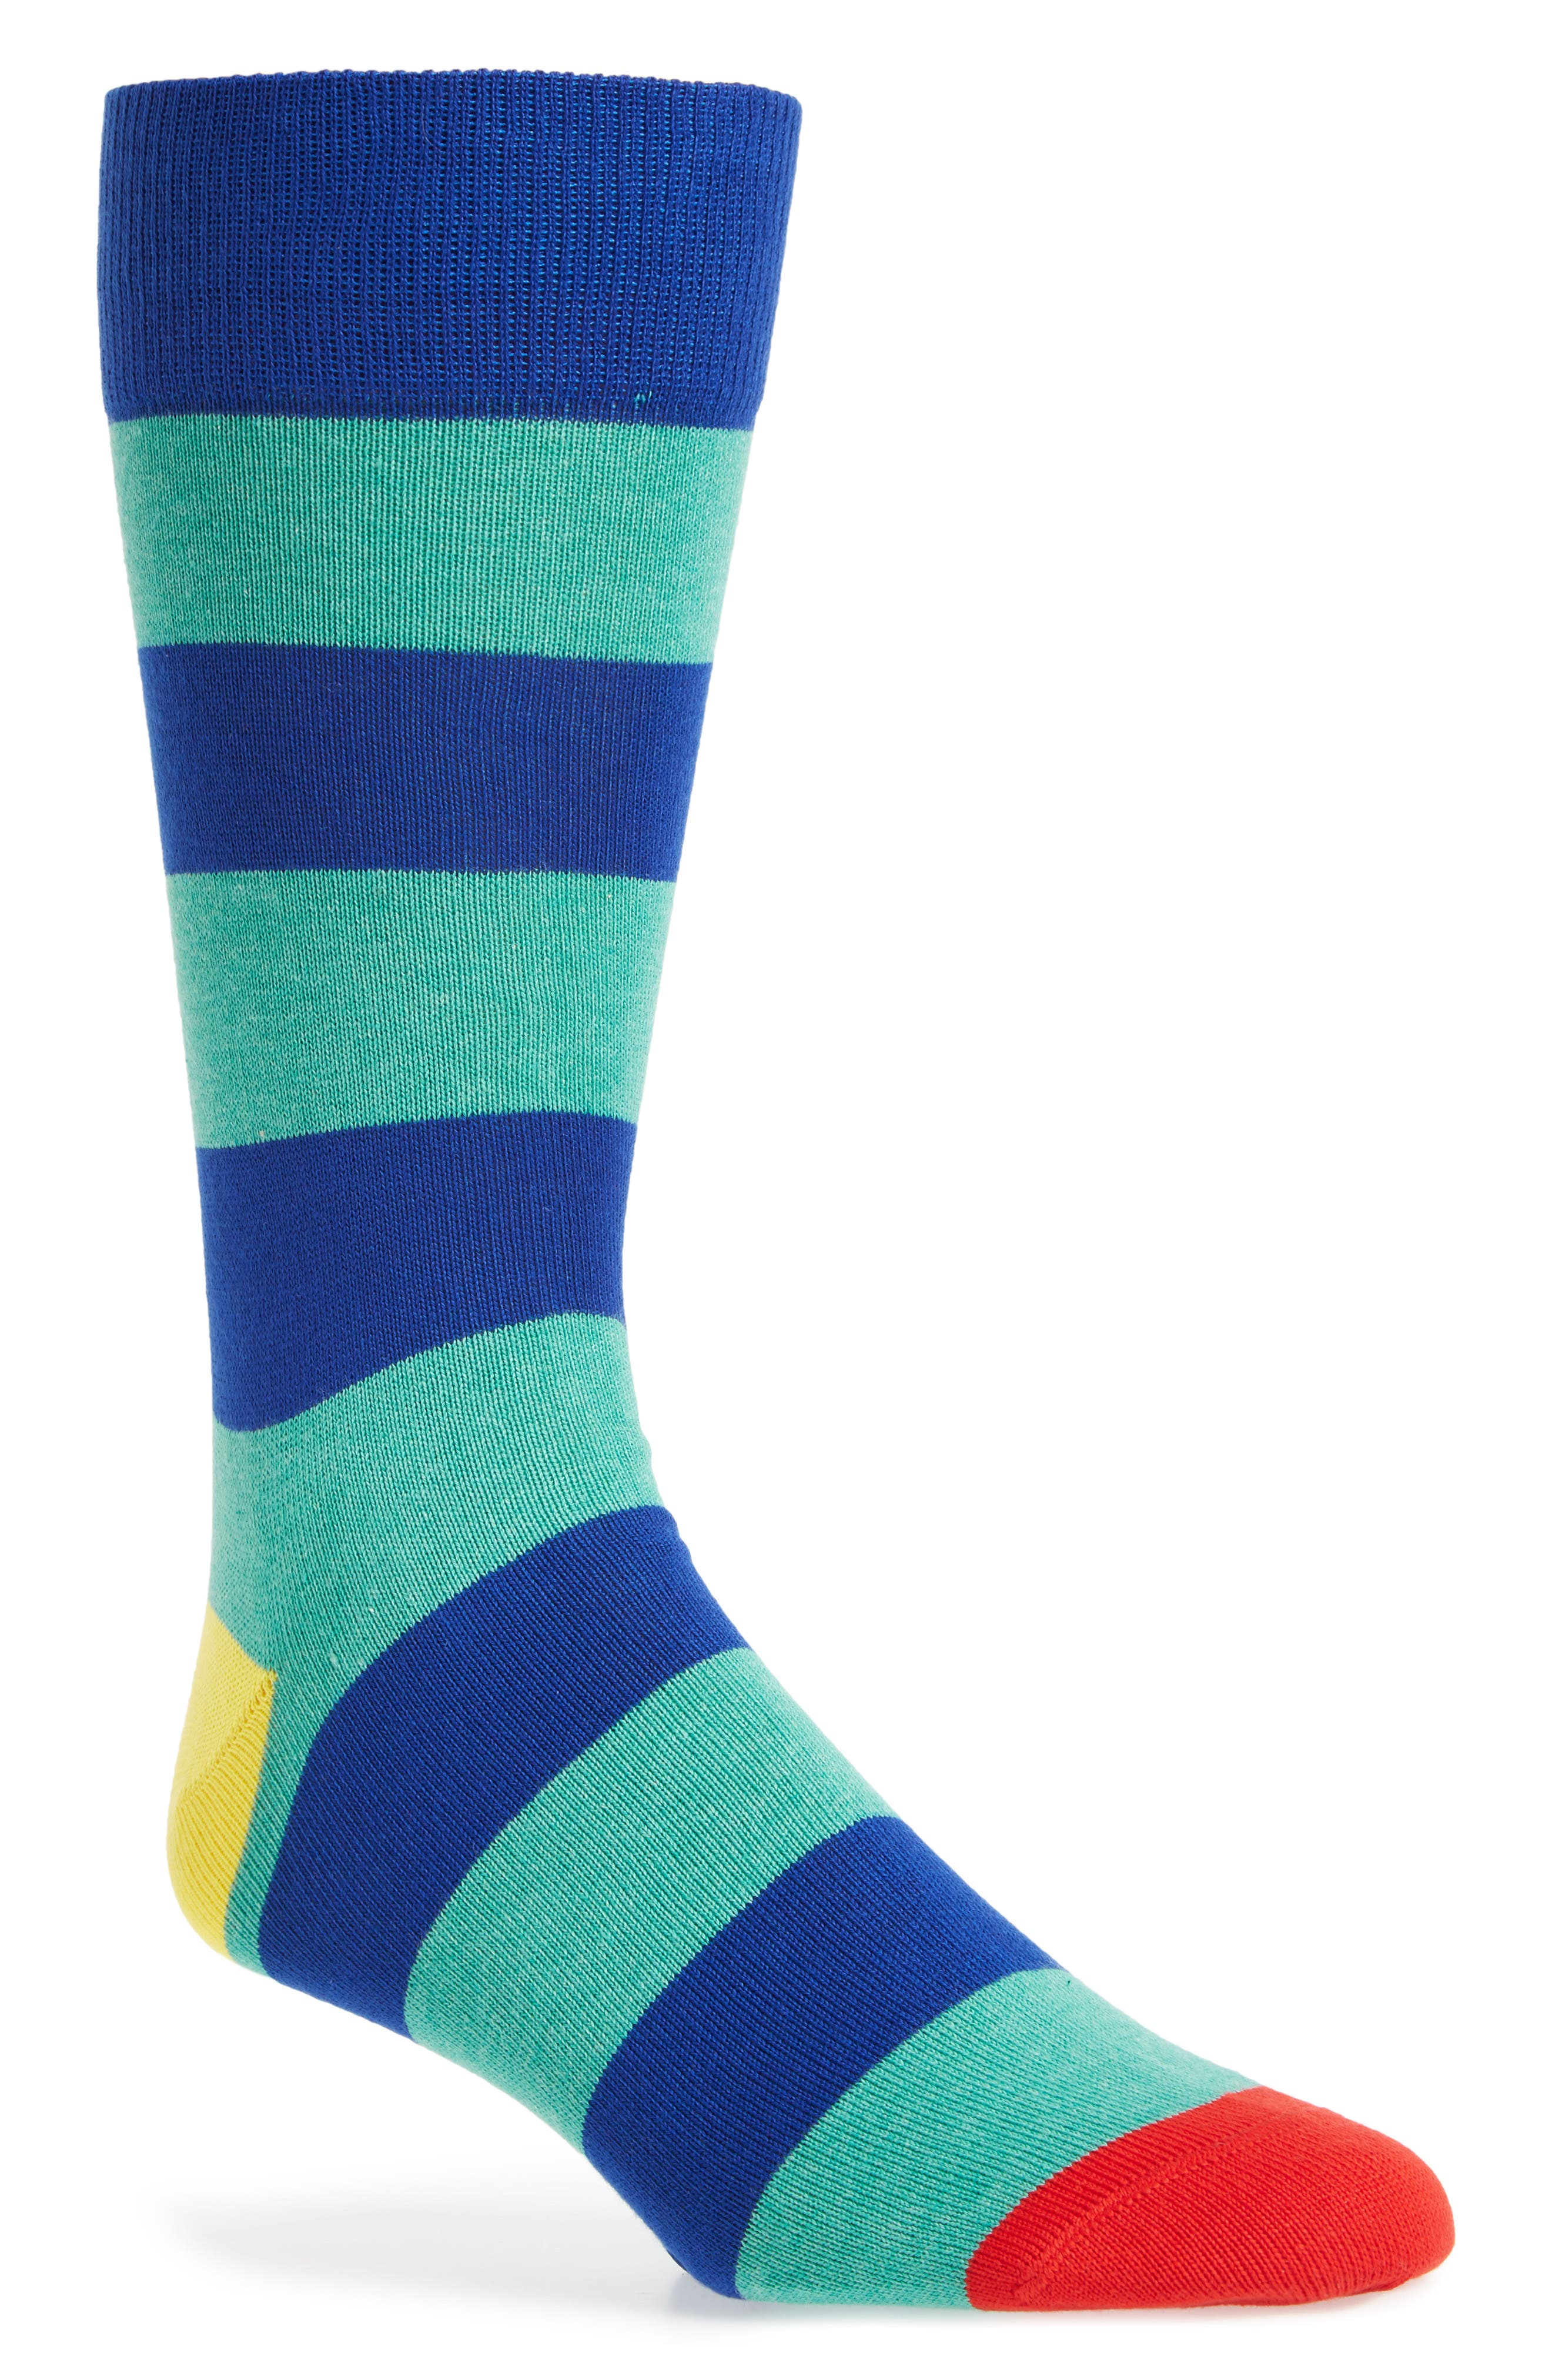 Stripe Socks,                         Main,                         color, Green/ Blue